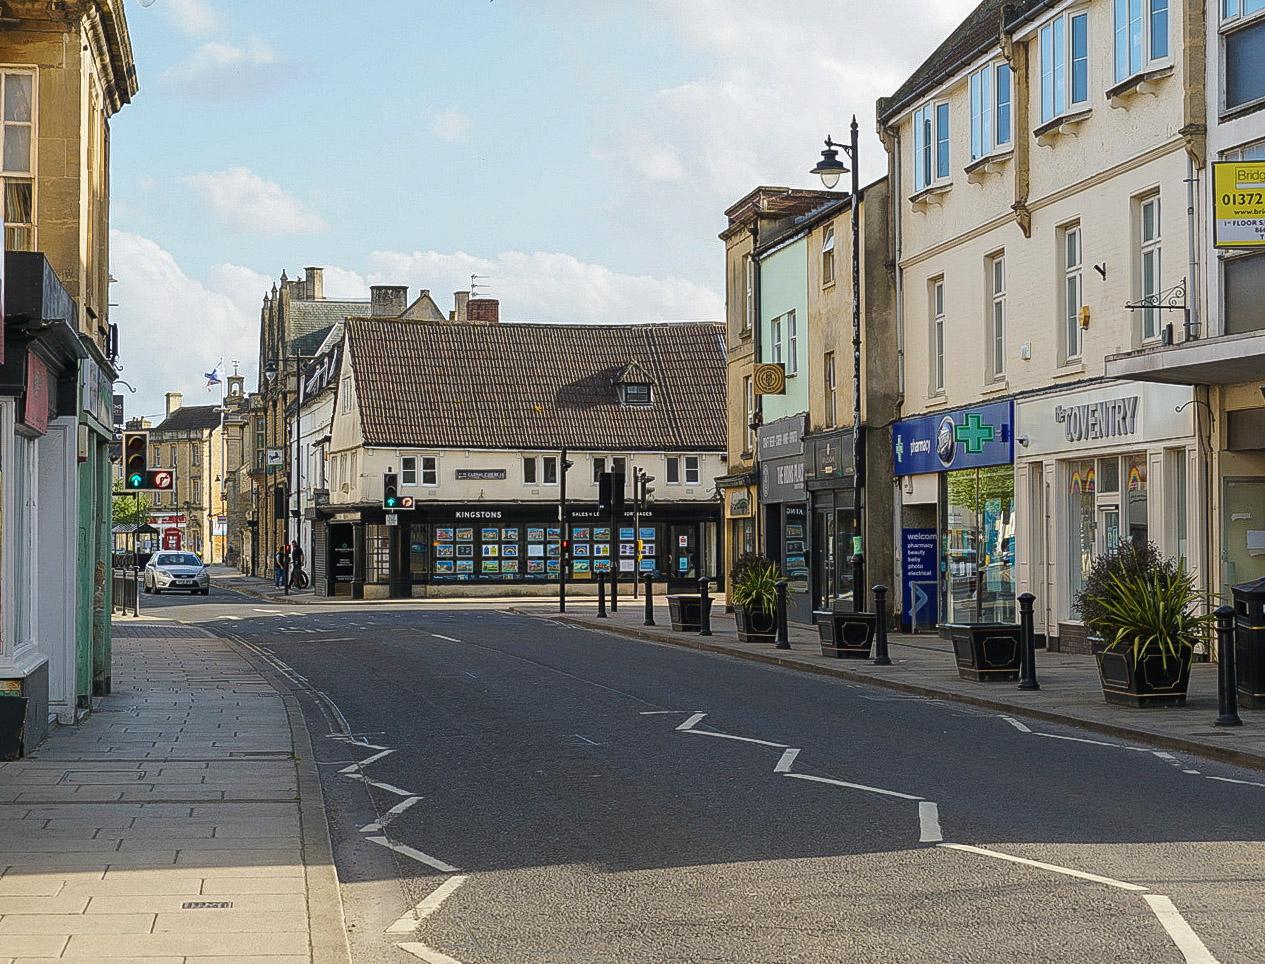 20200522 Melksham High Street